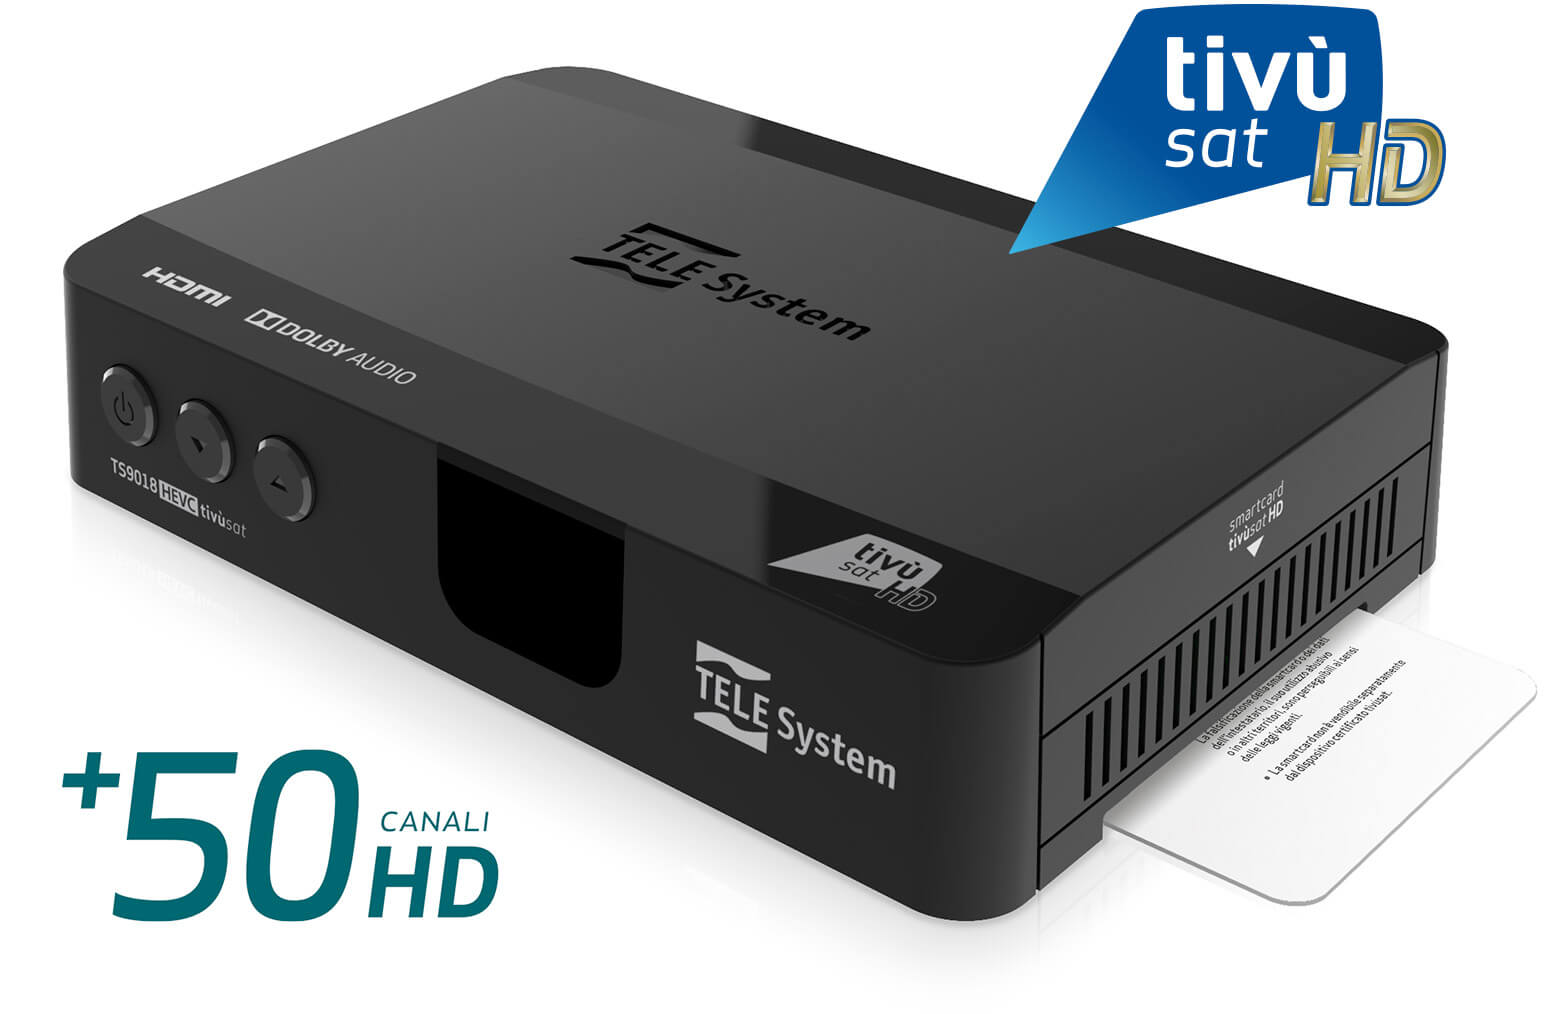 Tivusat-tele-system-ts-9018